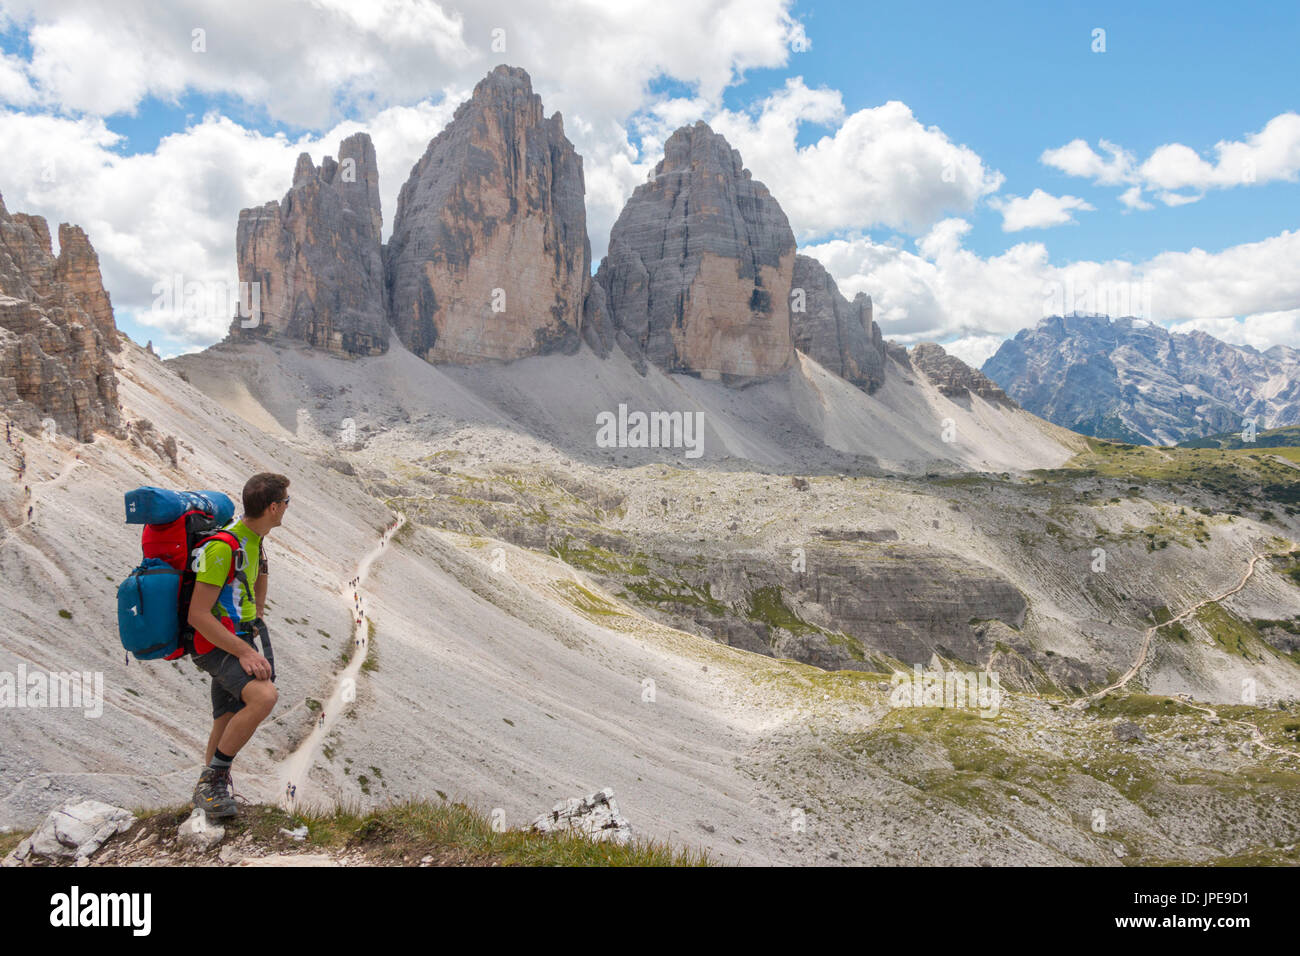 Hicker admire the Three Peaks of Lavaredo. Sesto Dolomites, Trentino Alto Adige, Italy, Europe - Stock Image